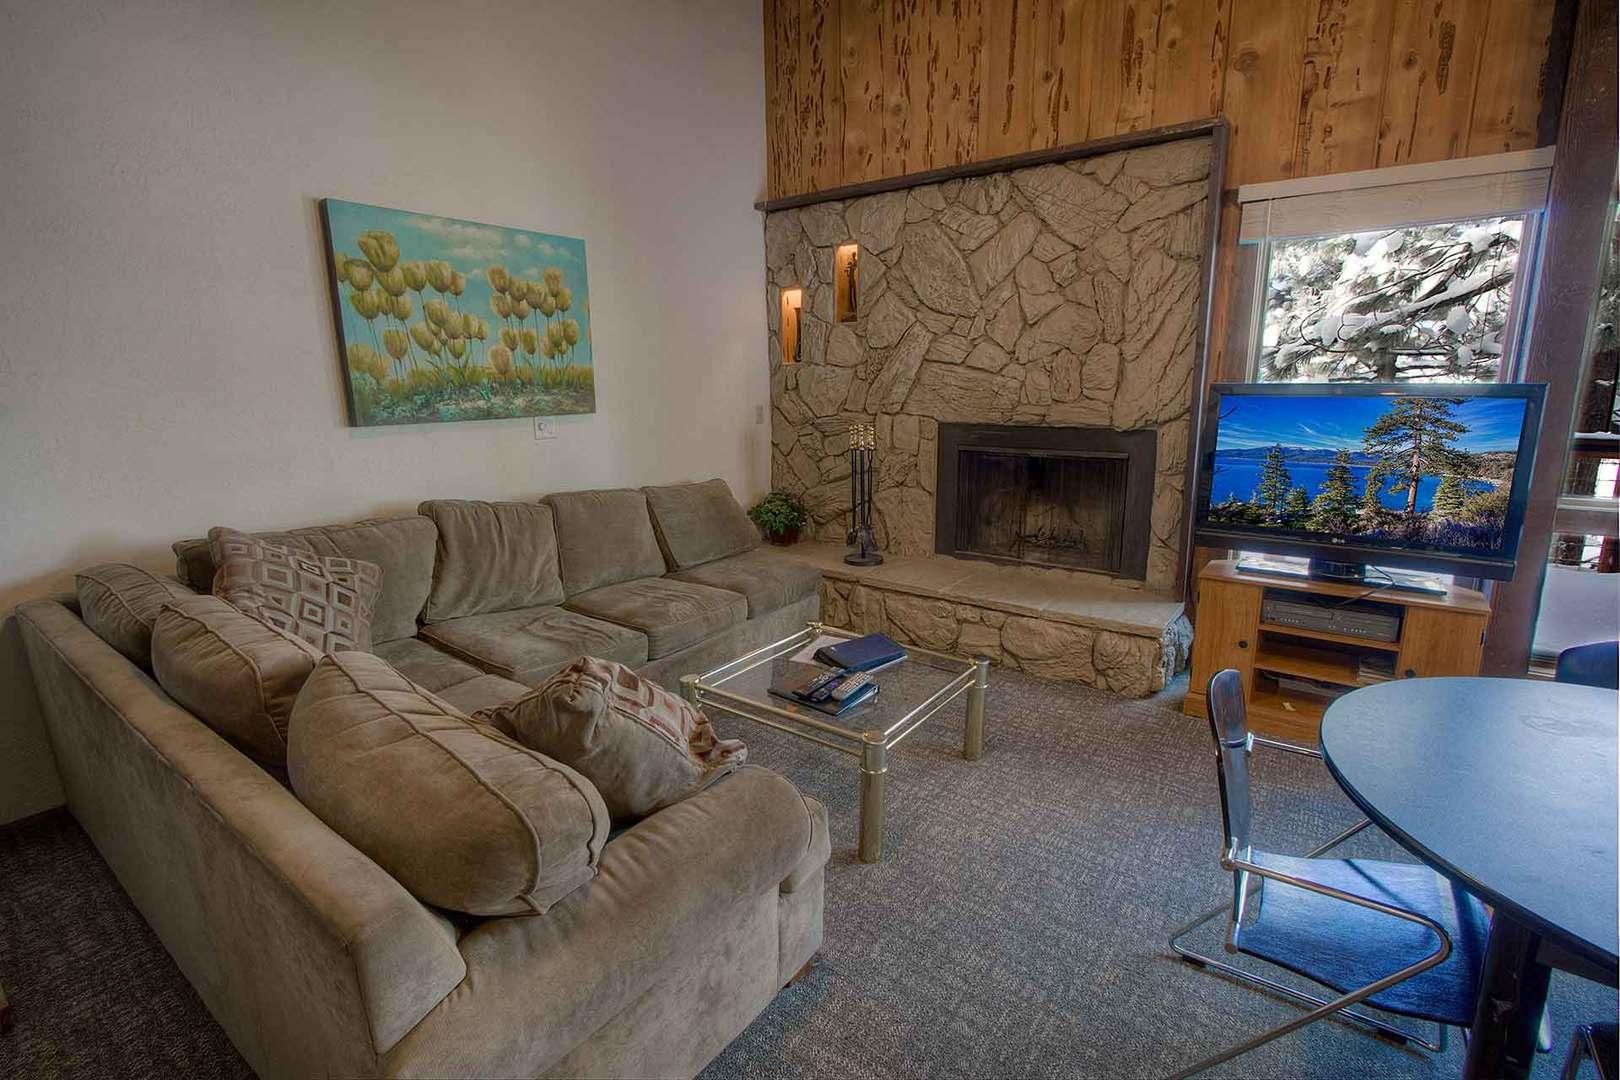 hnc0804 Living room